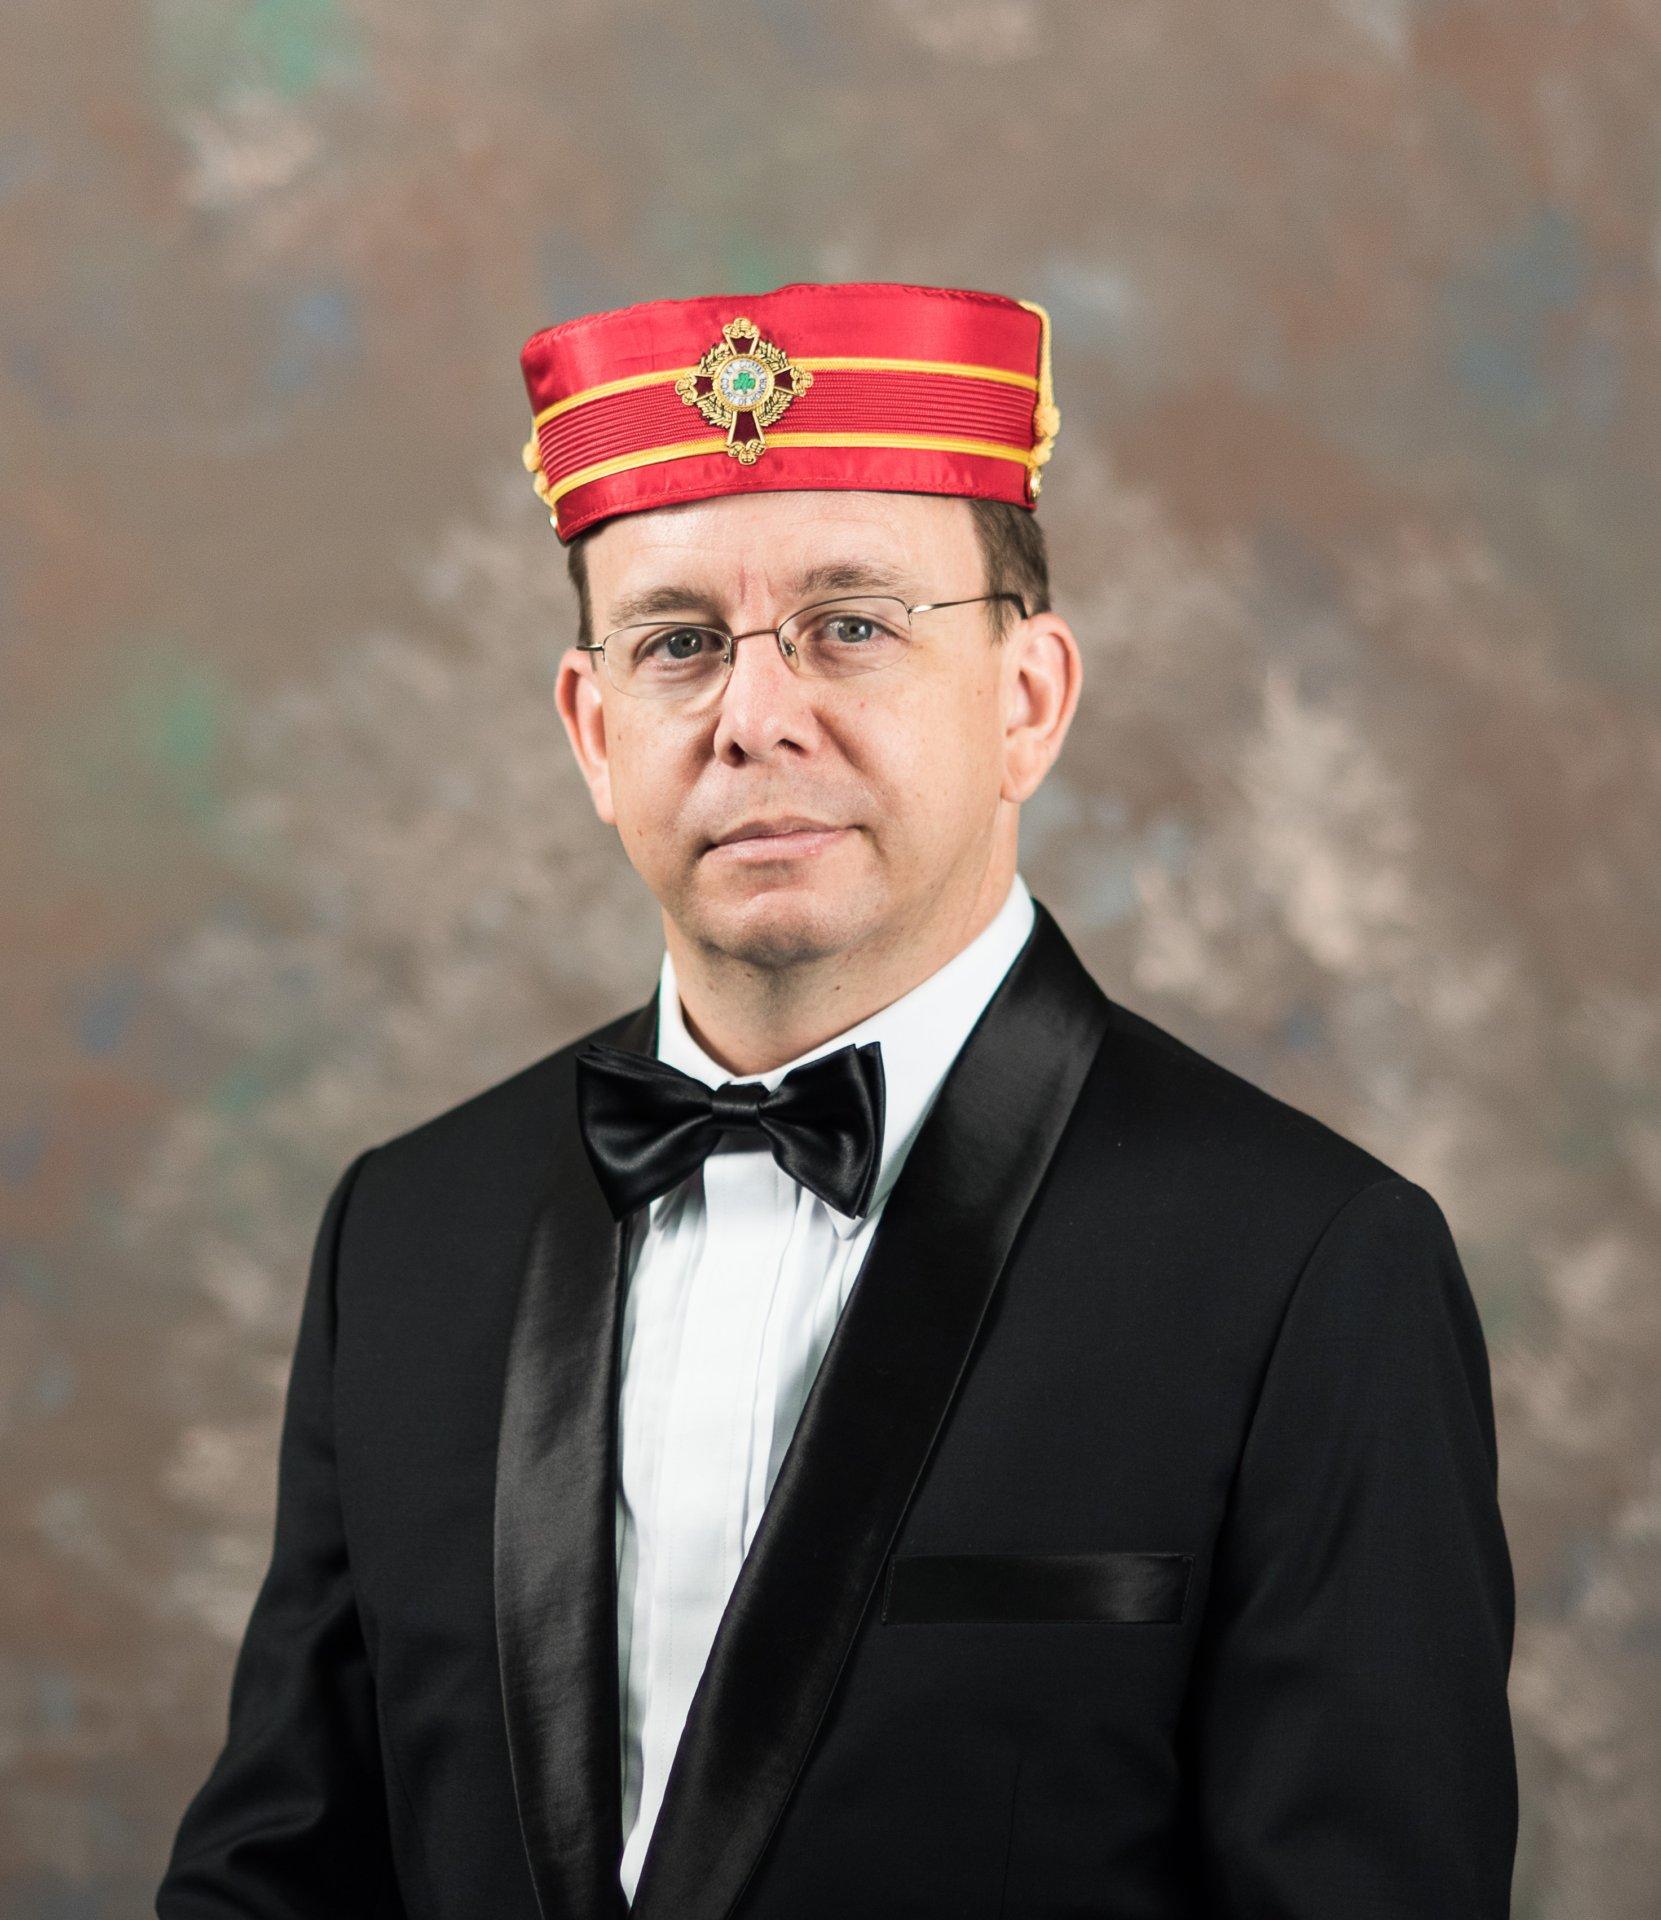 Greg Martin Valker